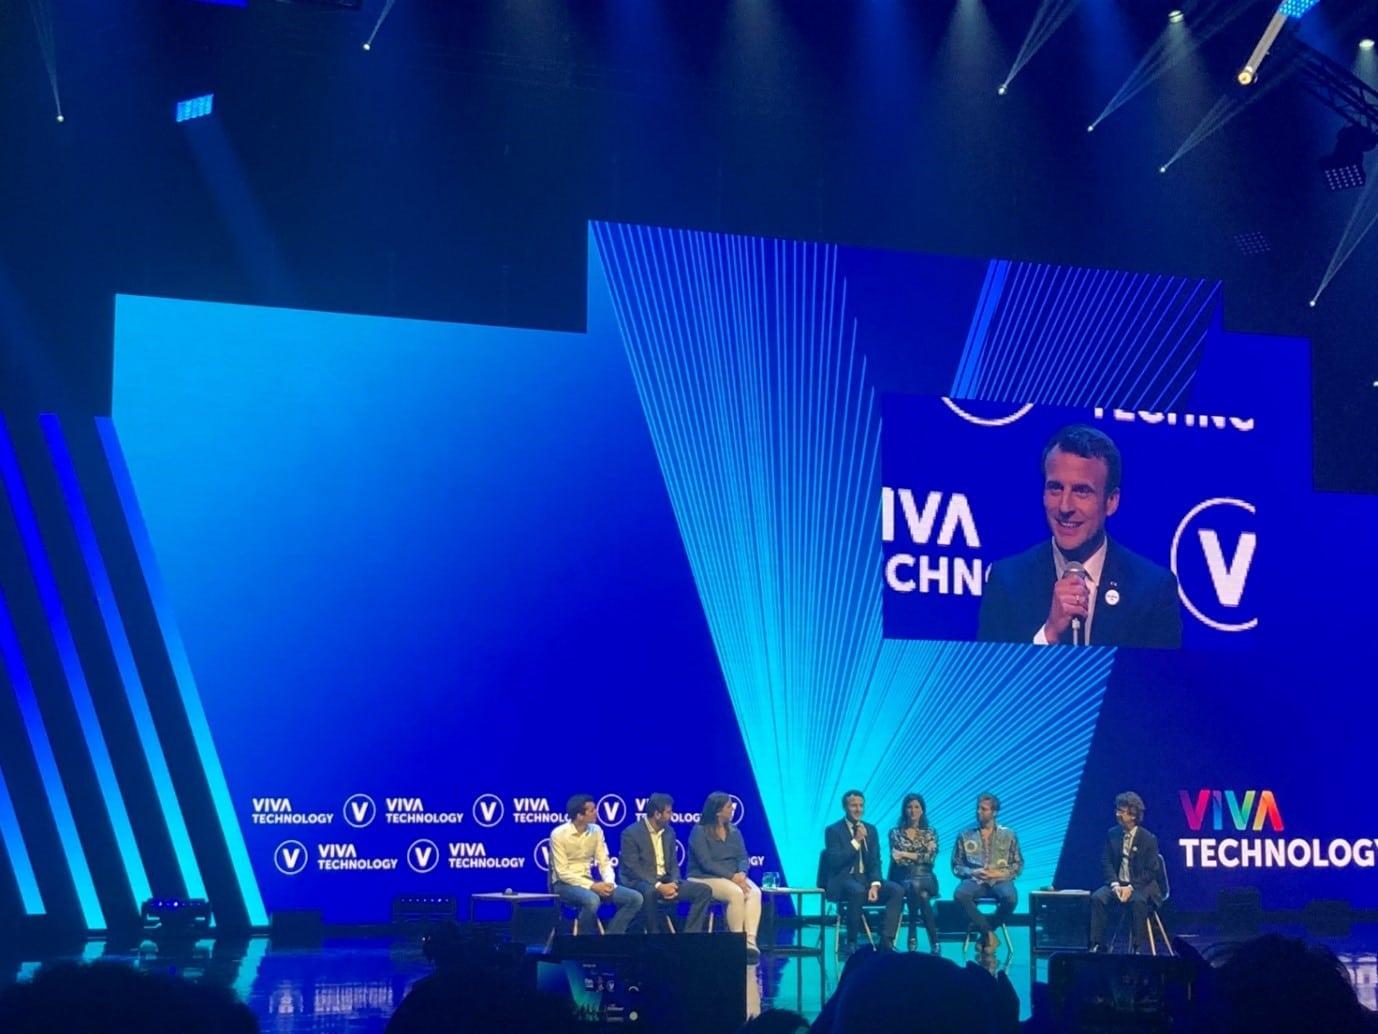 Viva Tech 2019